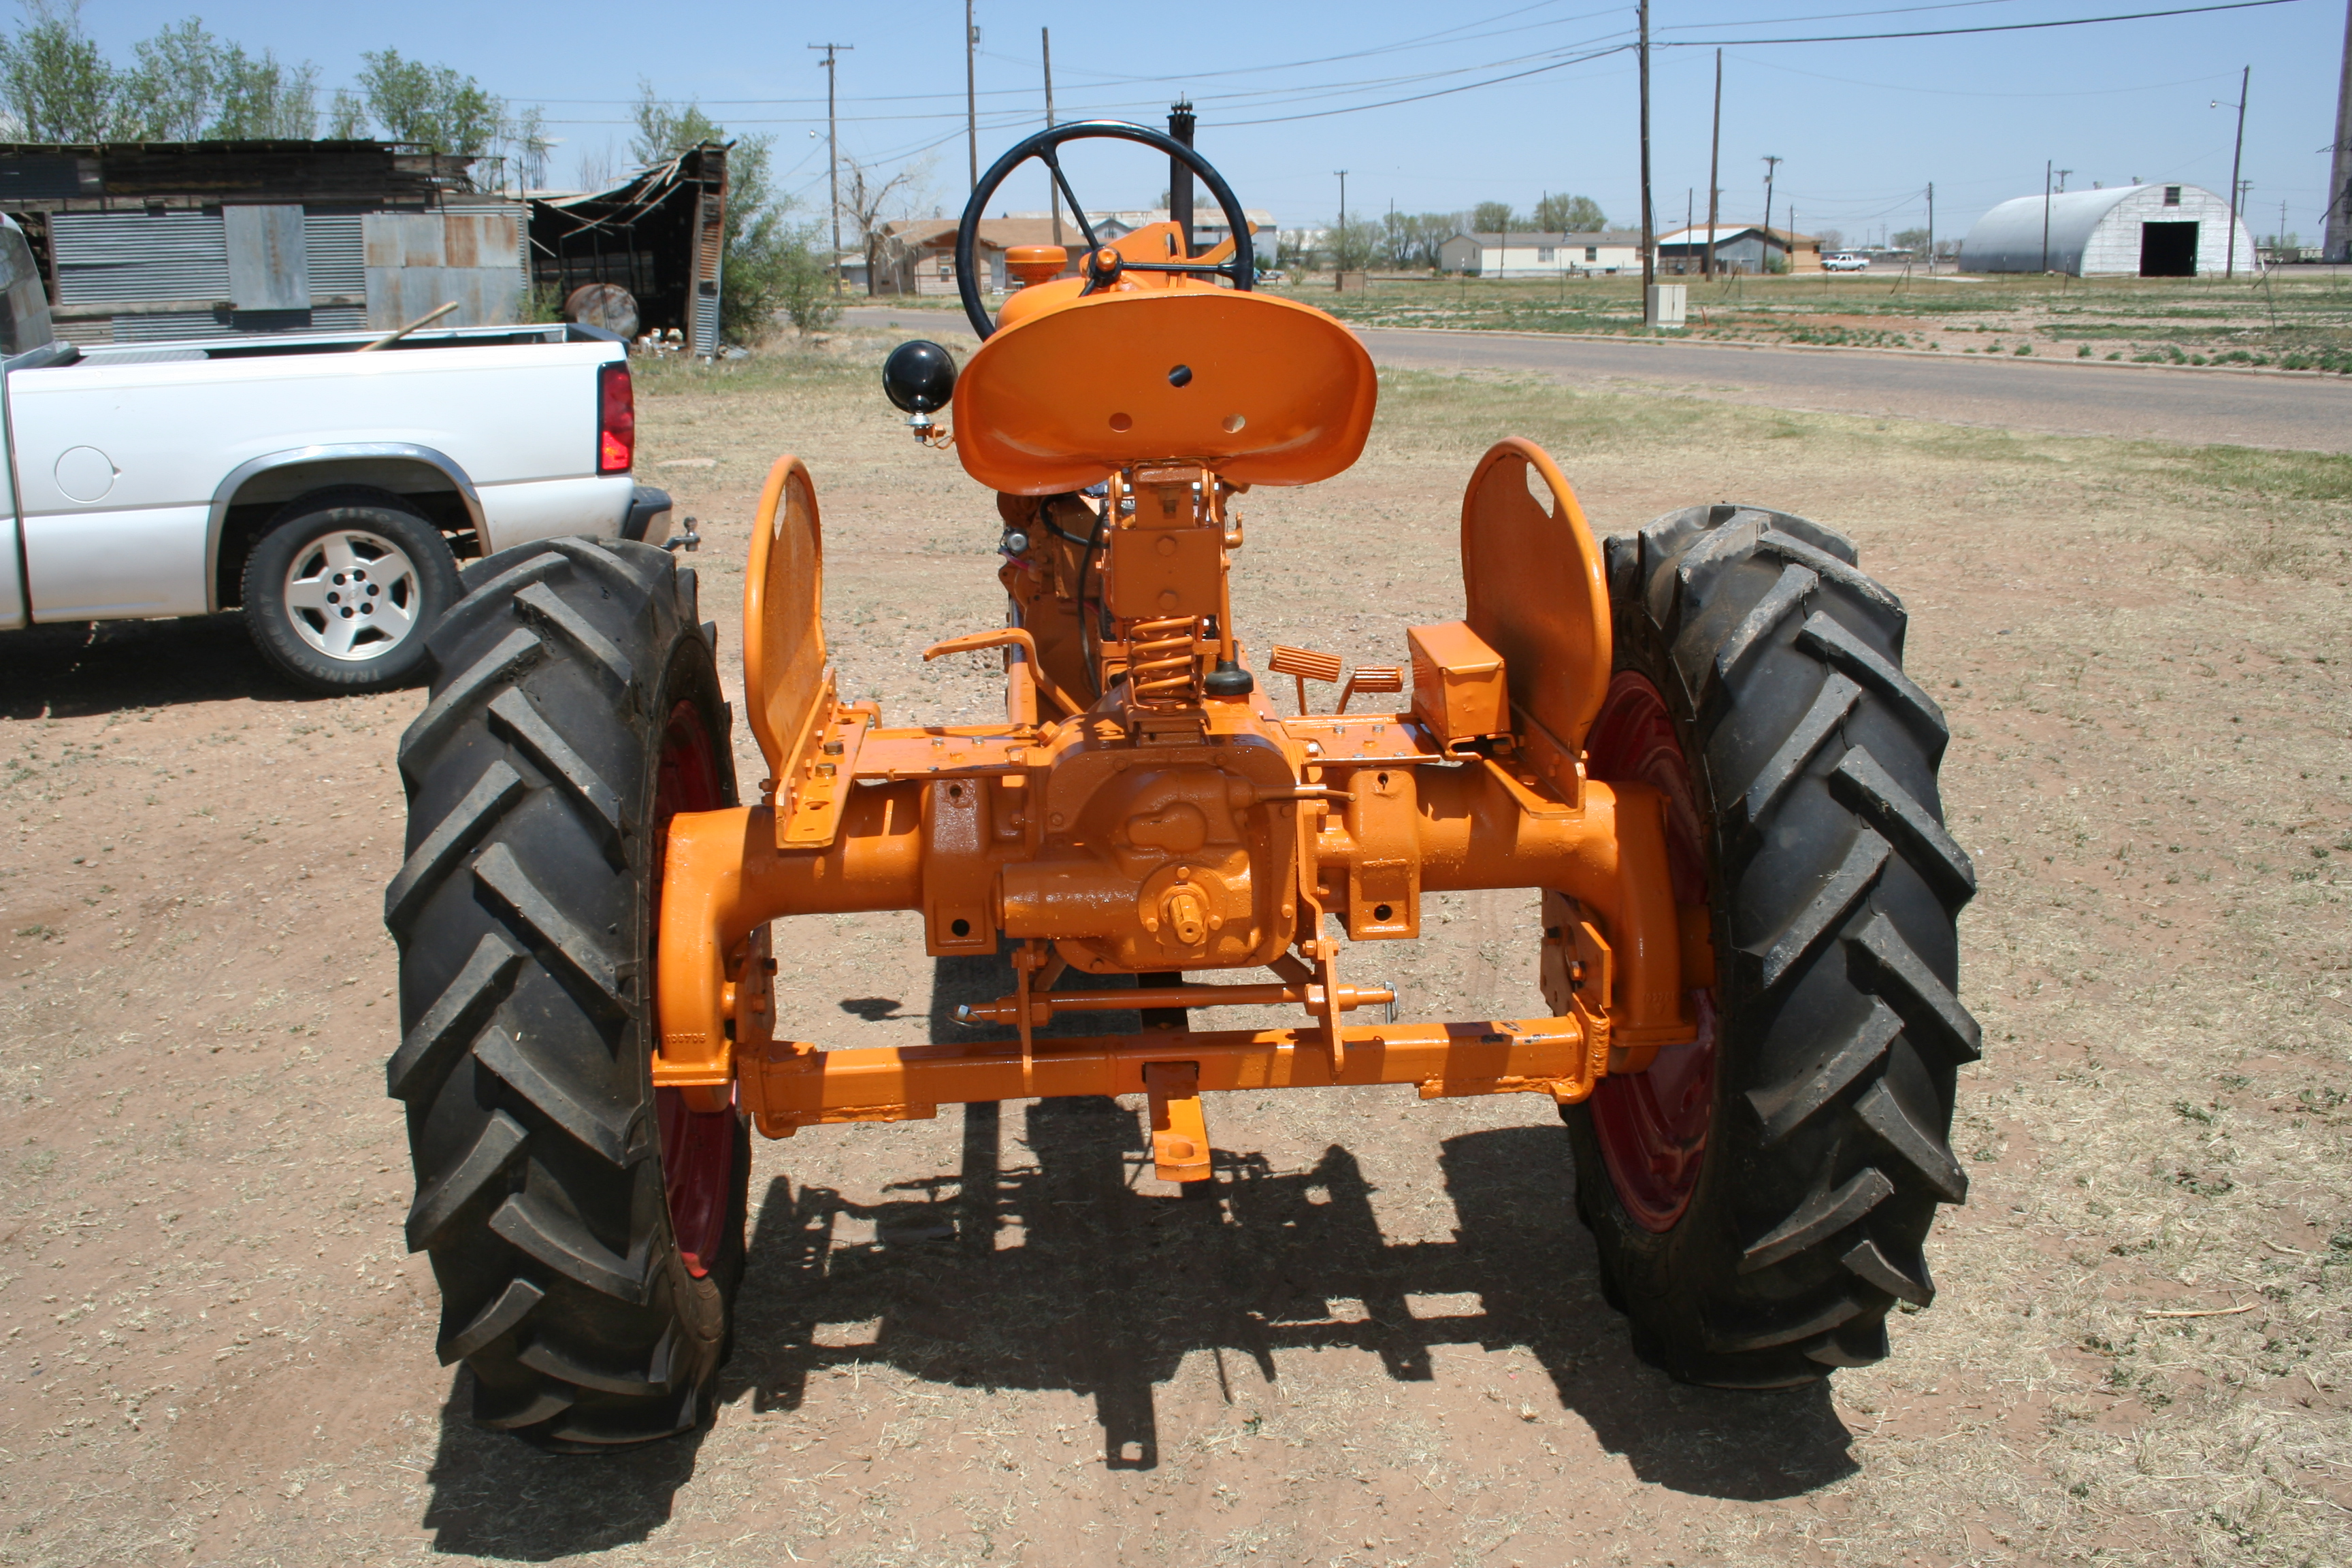 Craigslist Allis Chalmers >> Minneapolis-Moline BF/Avery R (1952)   Troy's Tractors